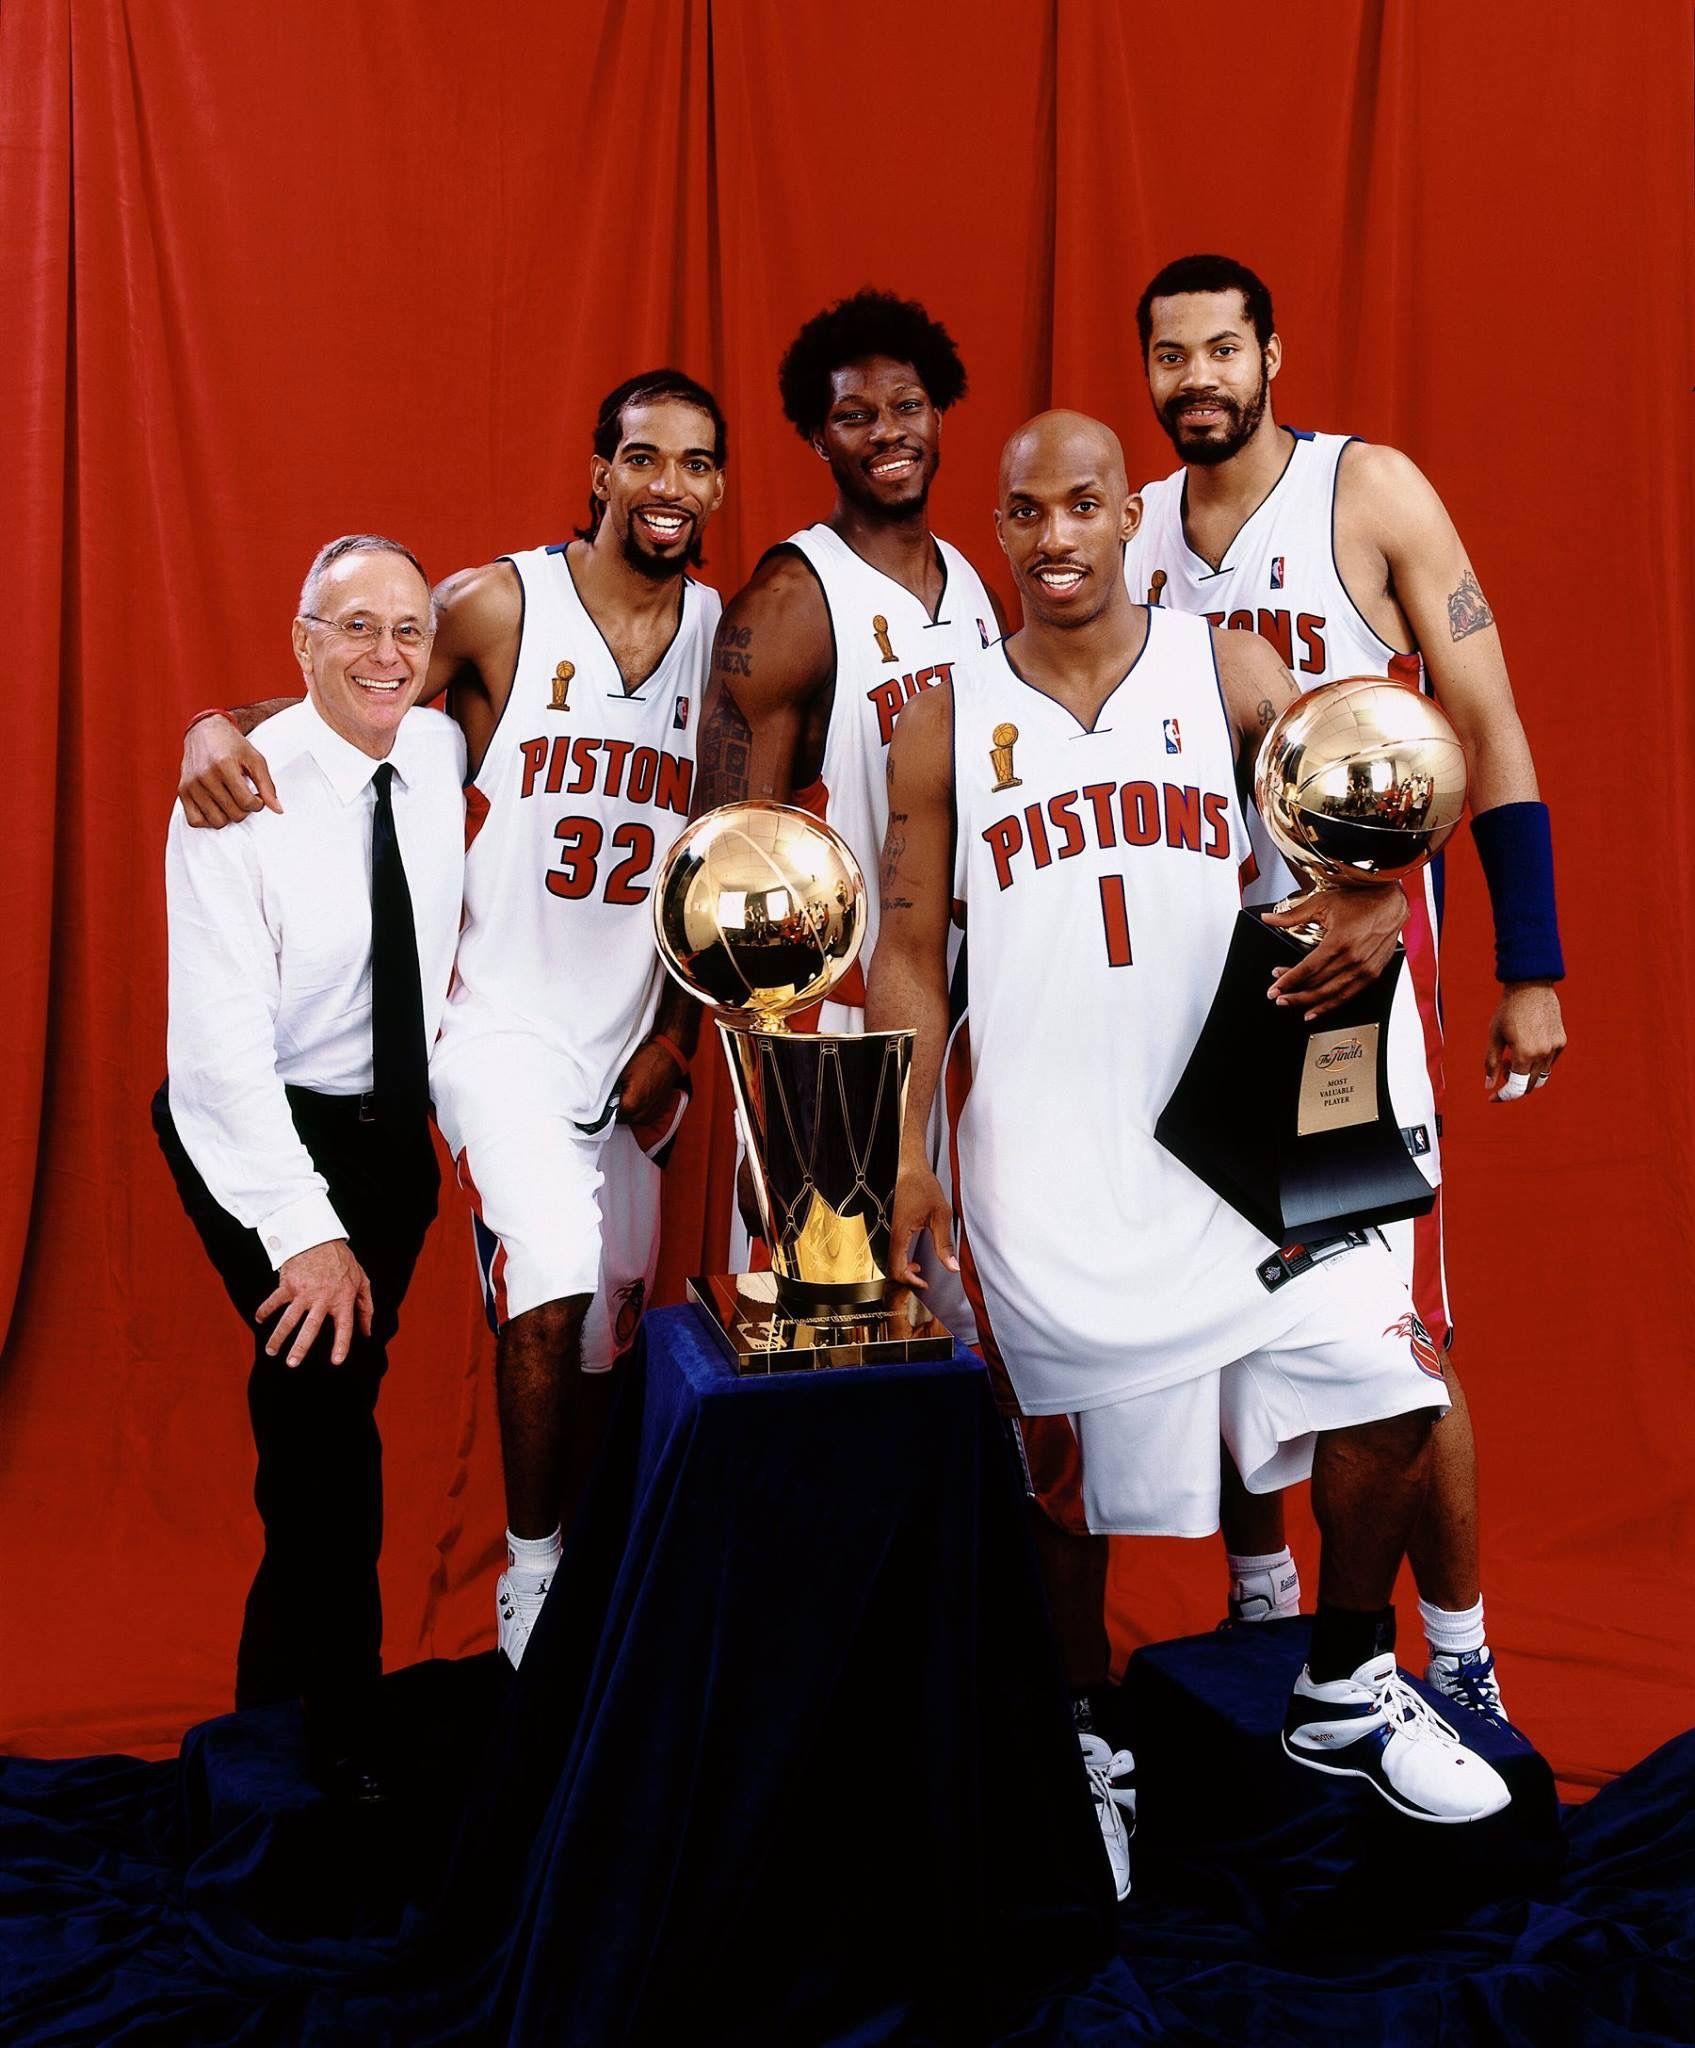 Detroitpistons Nba Champions Kobe Bryant Pictures Detroit Pistons Nba Houston Rockets